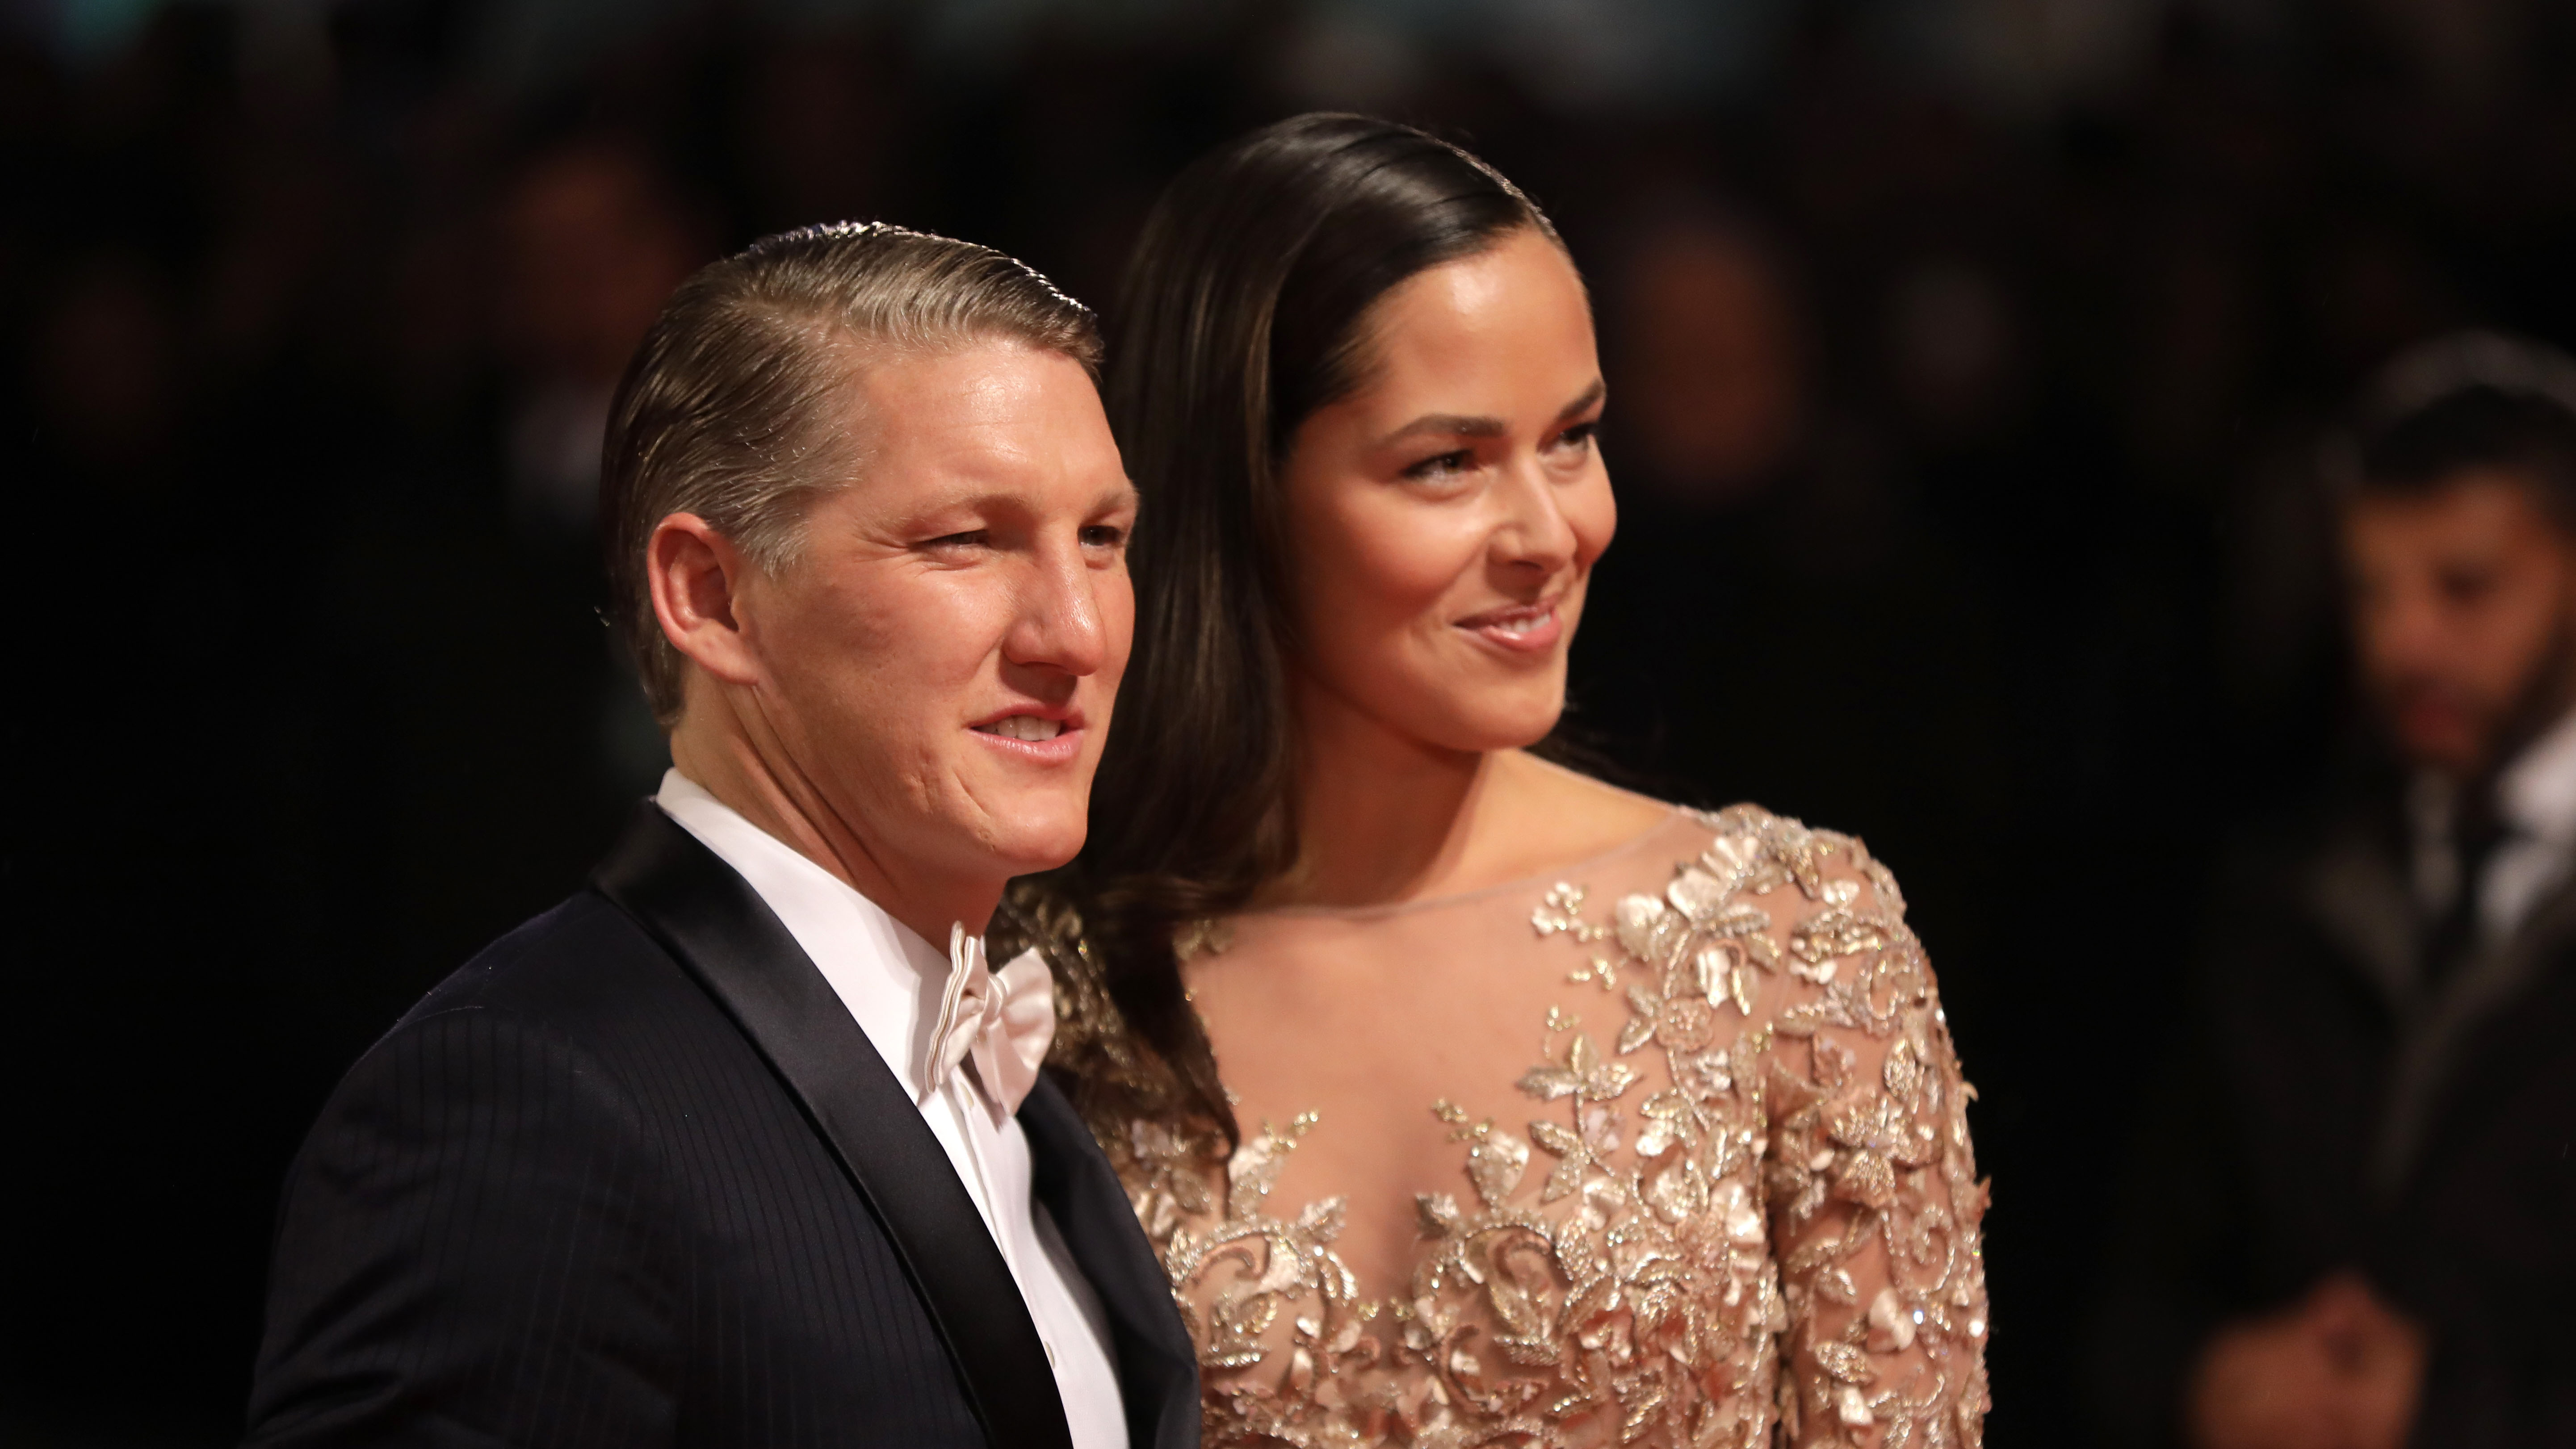 Bastian Schweinsteiger and Ana Ivanovic were married in July 2016.